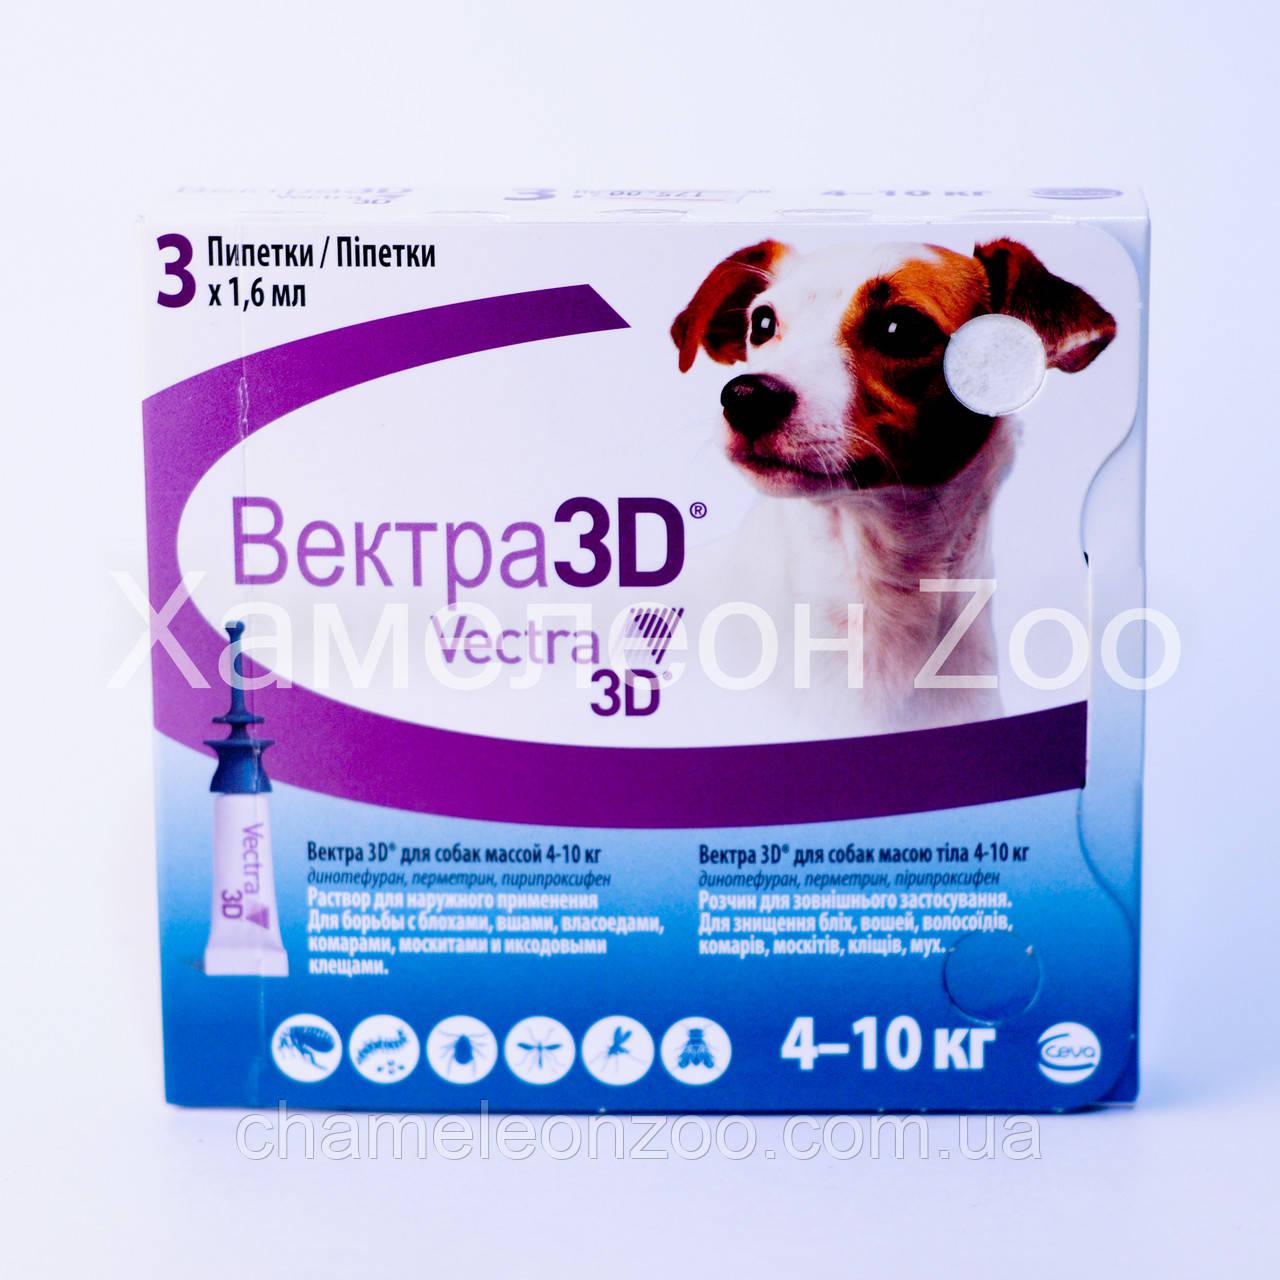 Капли Вектра 3D (Vektra 3D) для собак весом 4-10 кг 1 пипетка